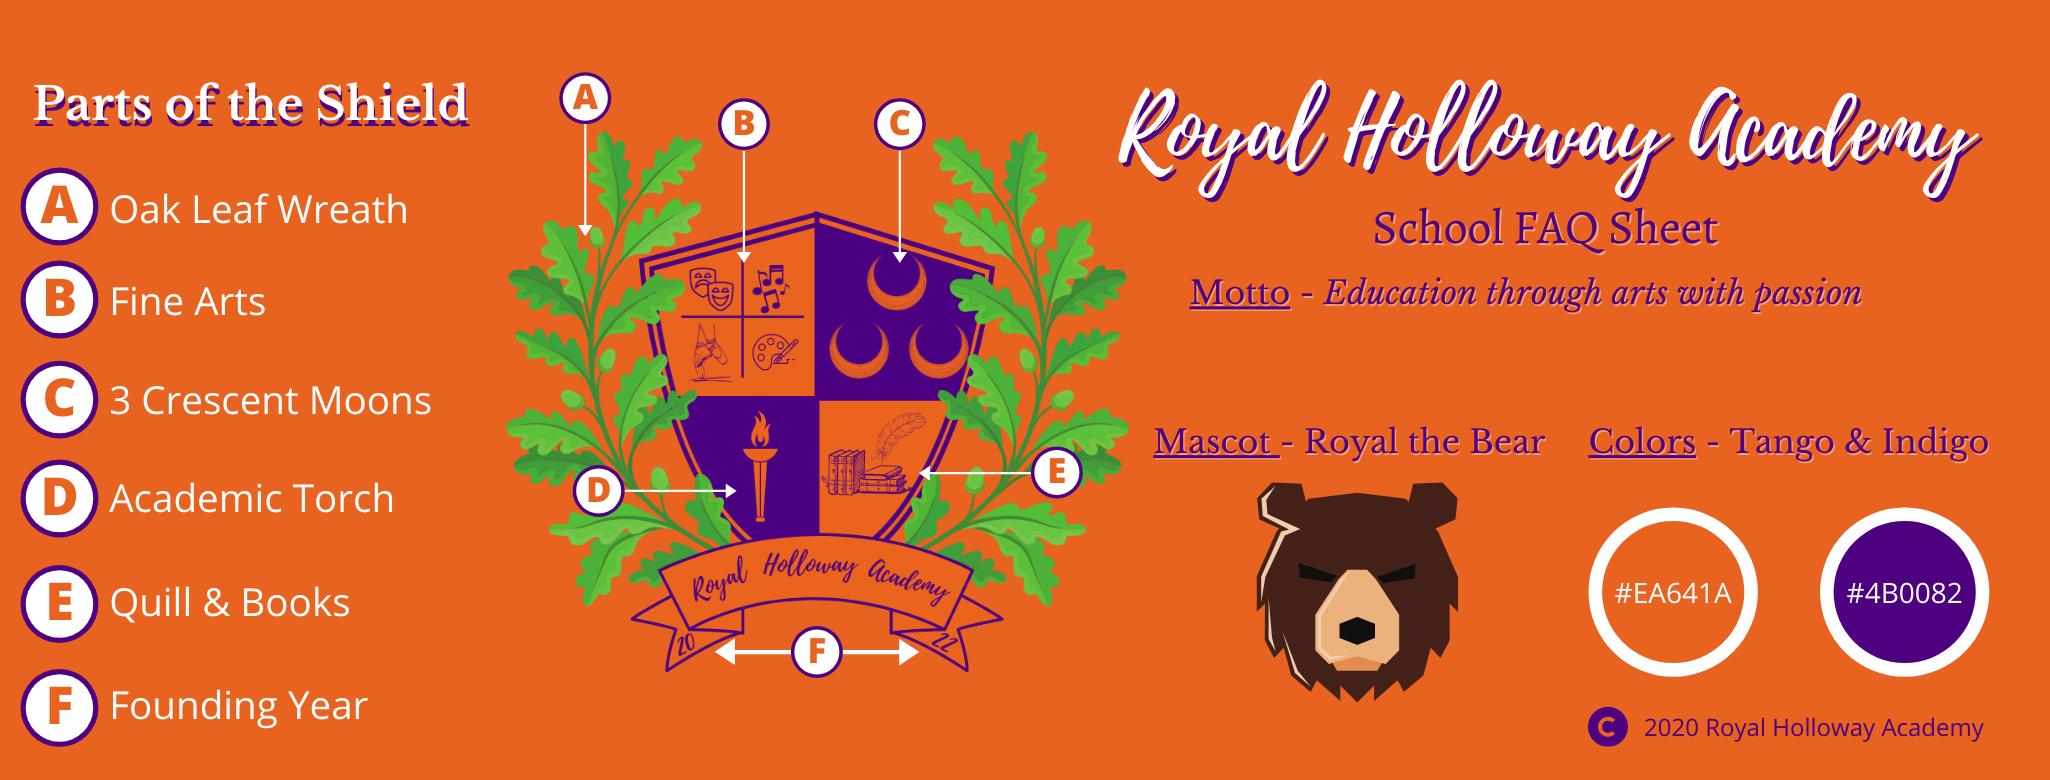 Royal Holloway Academy FAQs